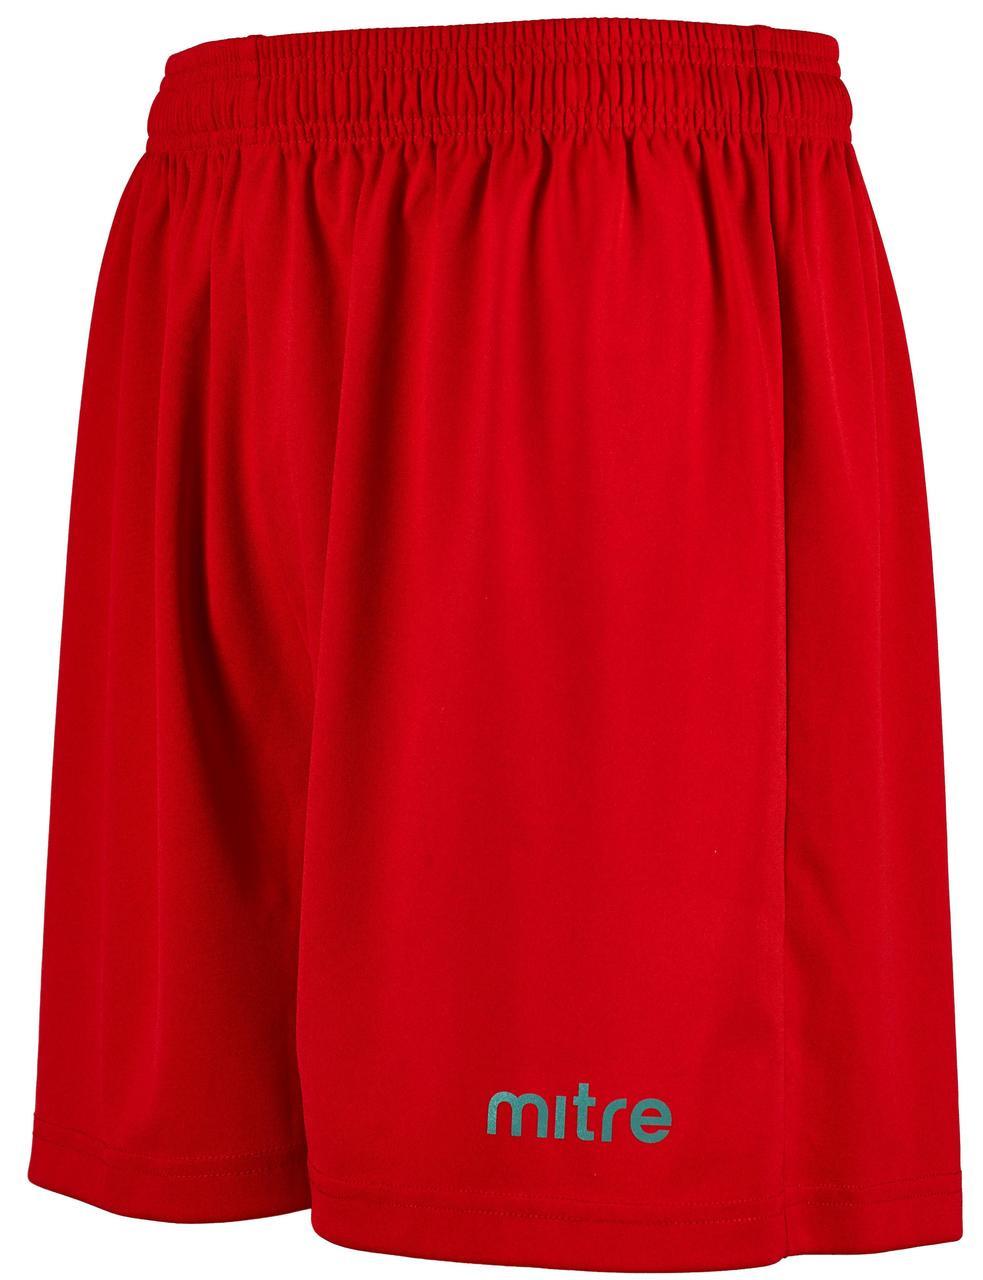 Mitre Metric Unisex Child Football Short